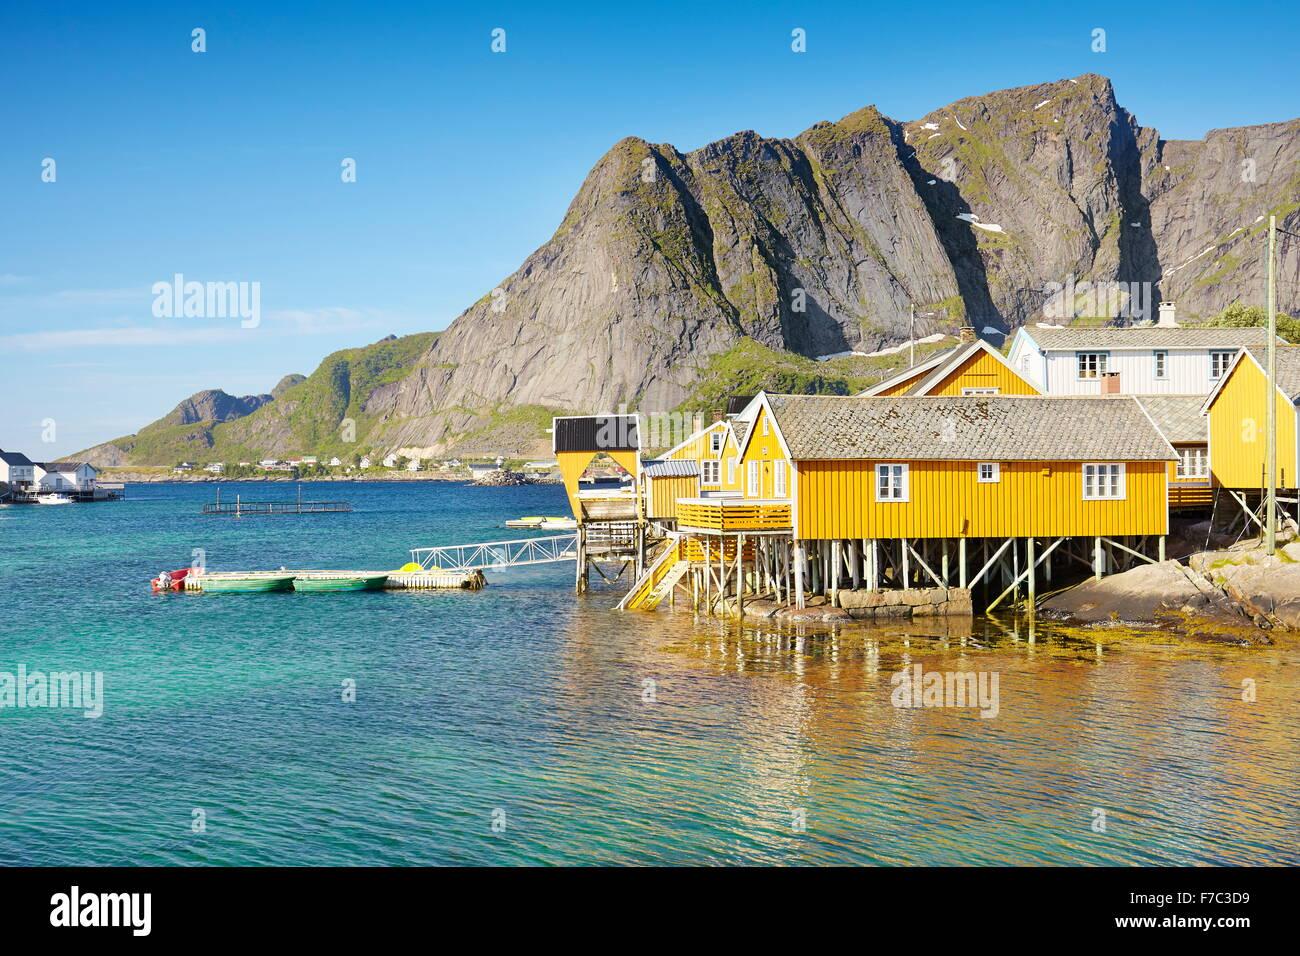 Maisons de pêcheurs Taditional rorbu, îles Lofoten, Norvège Photo Stock